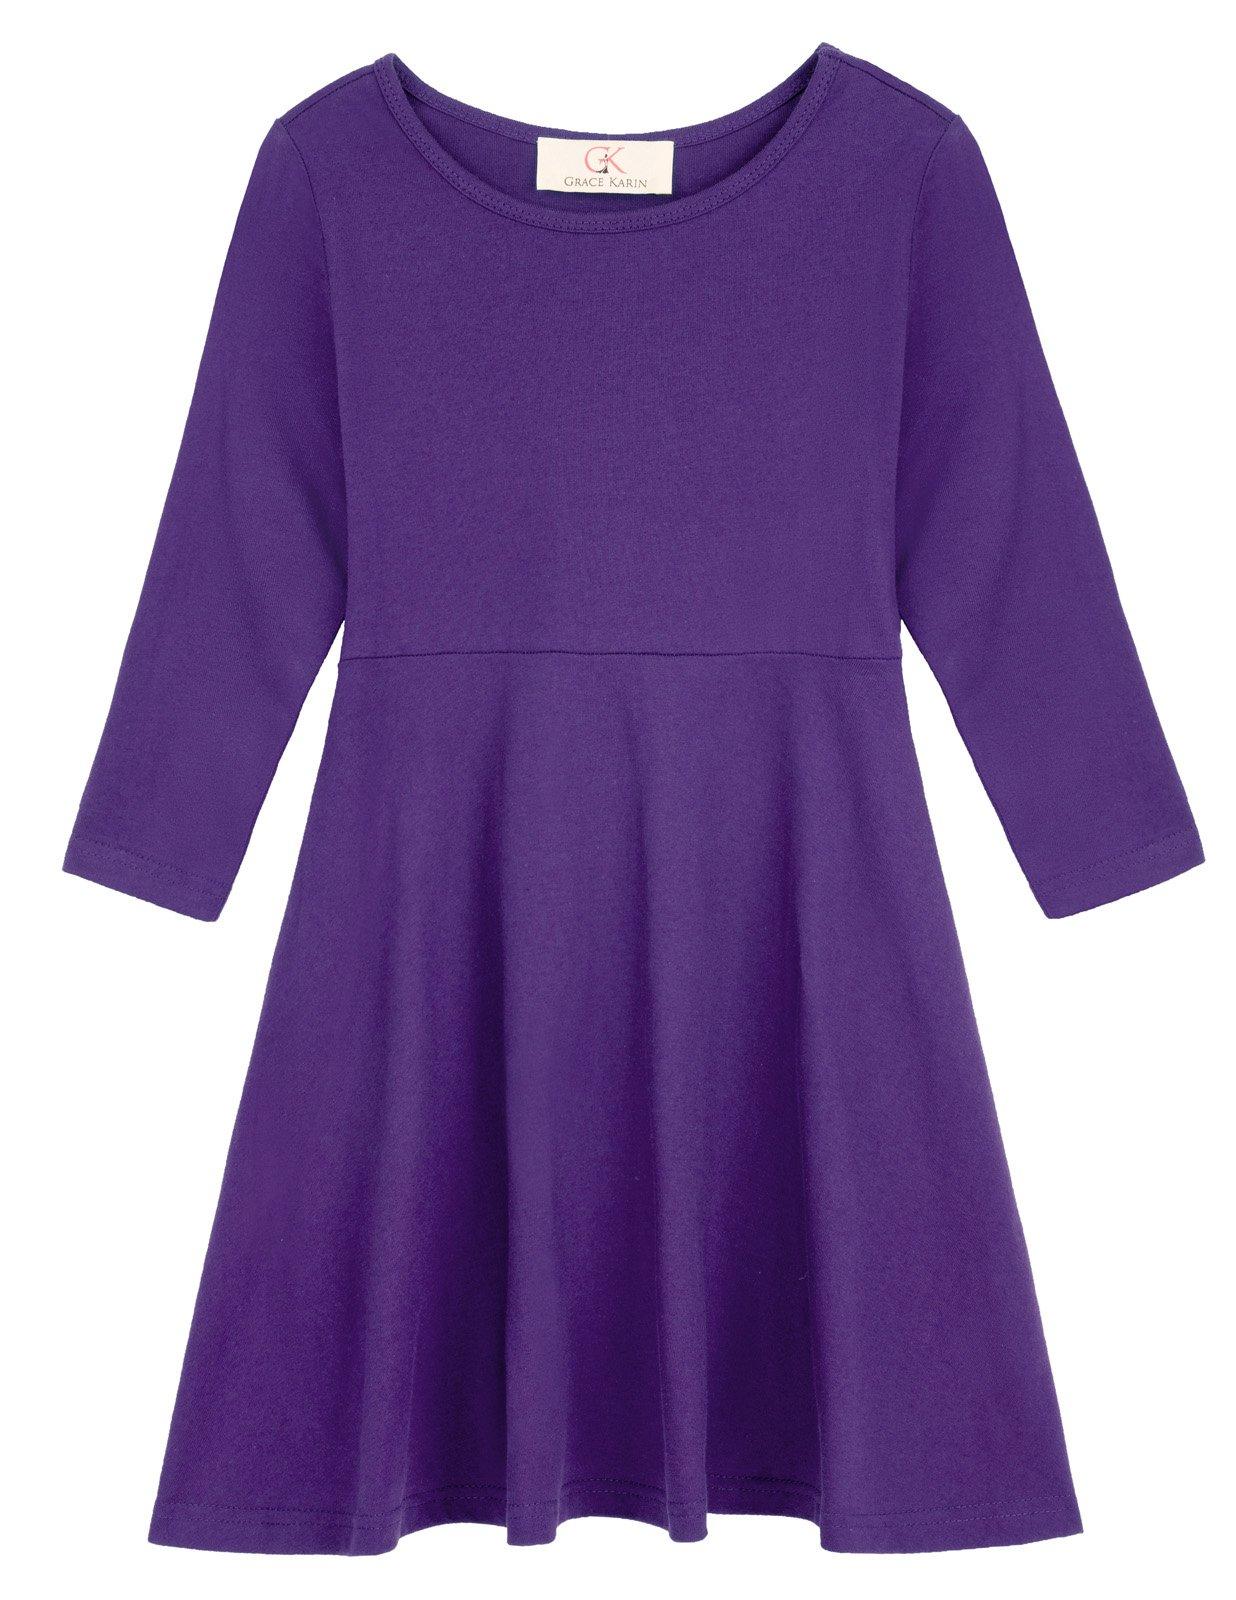 Girls Long Sleeve Vintage Retro Cotton Dresses 10-11yrs CL10628-3